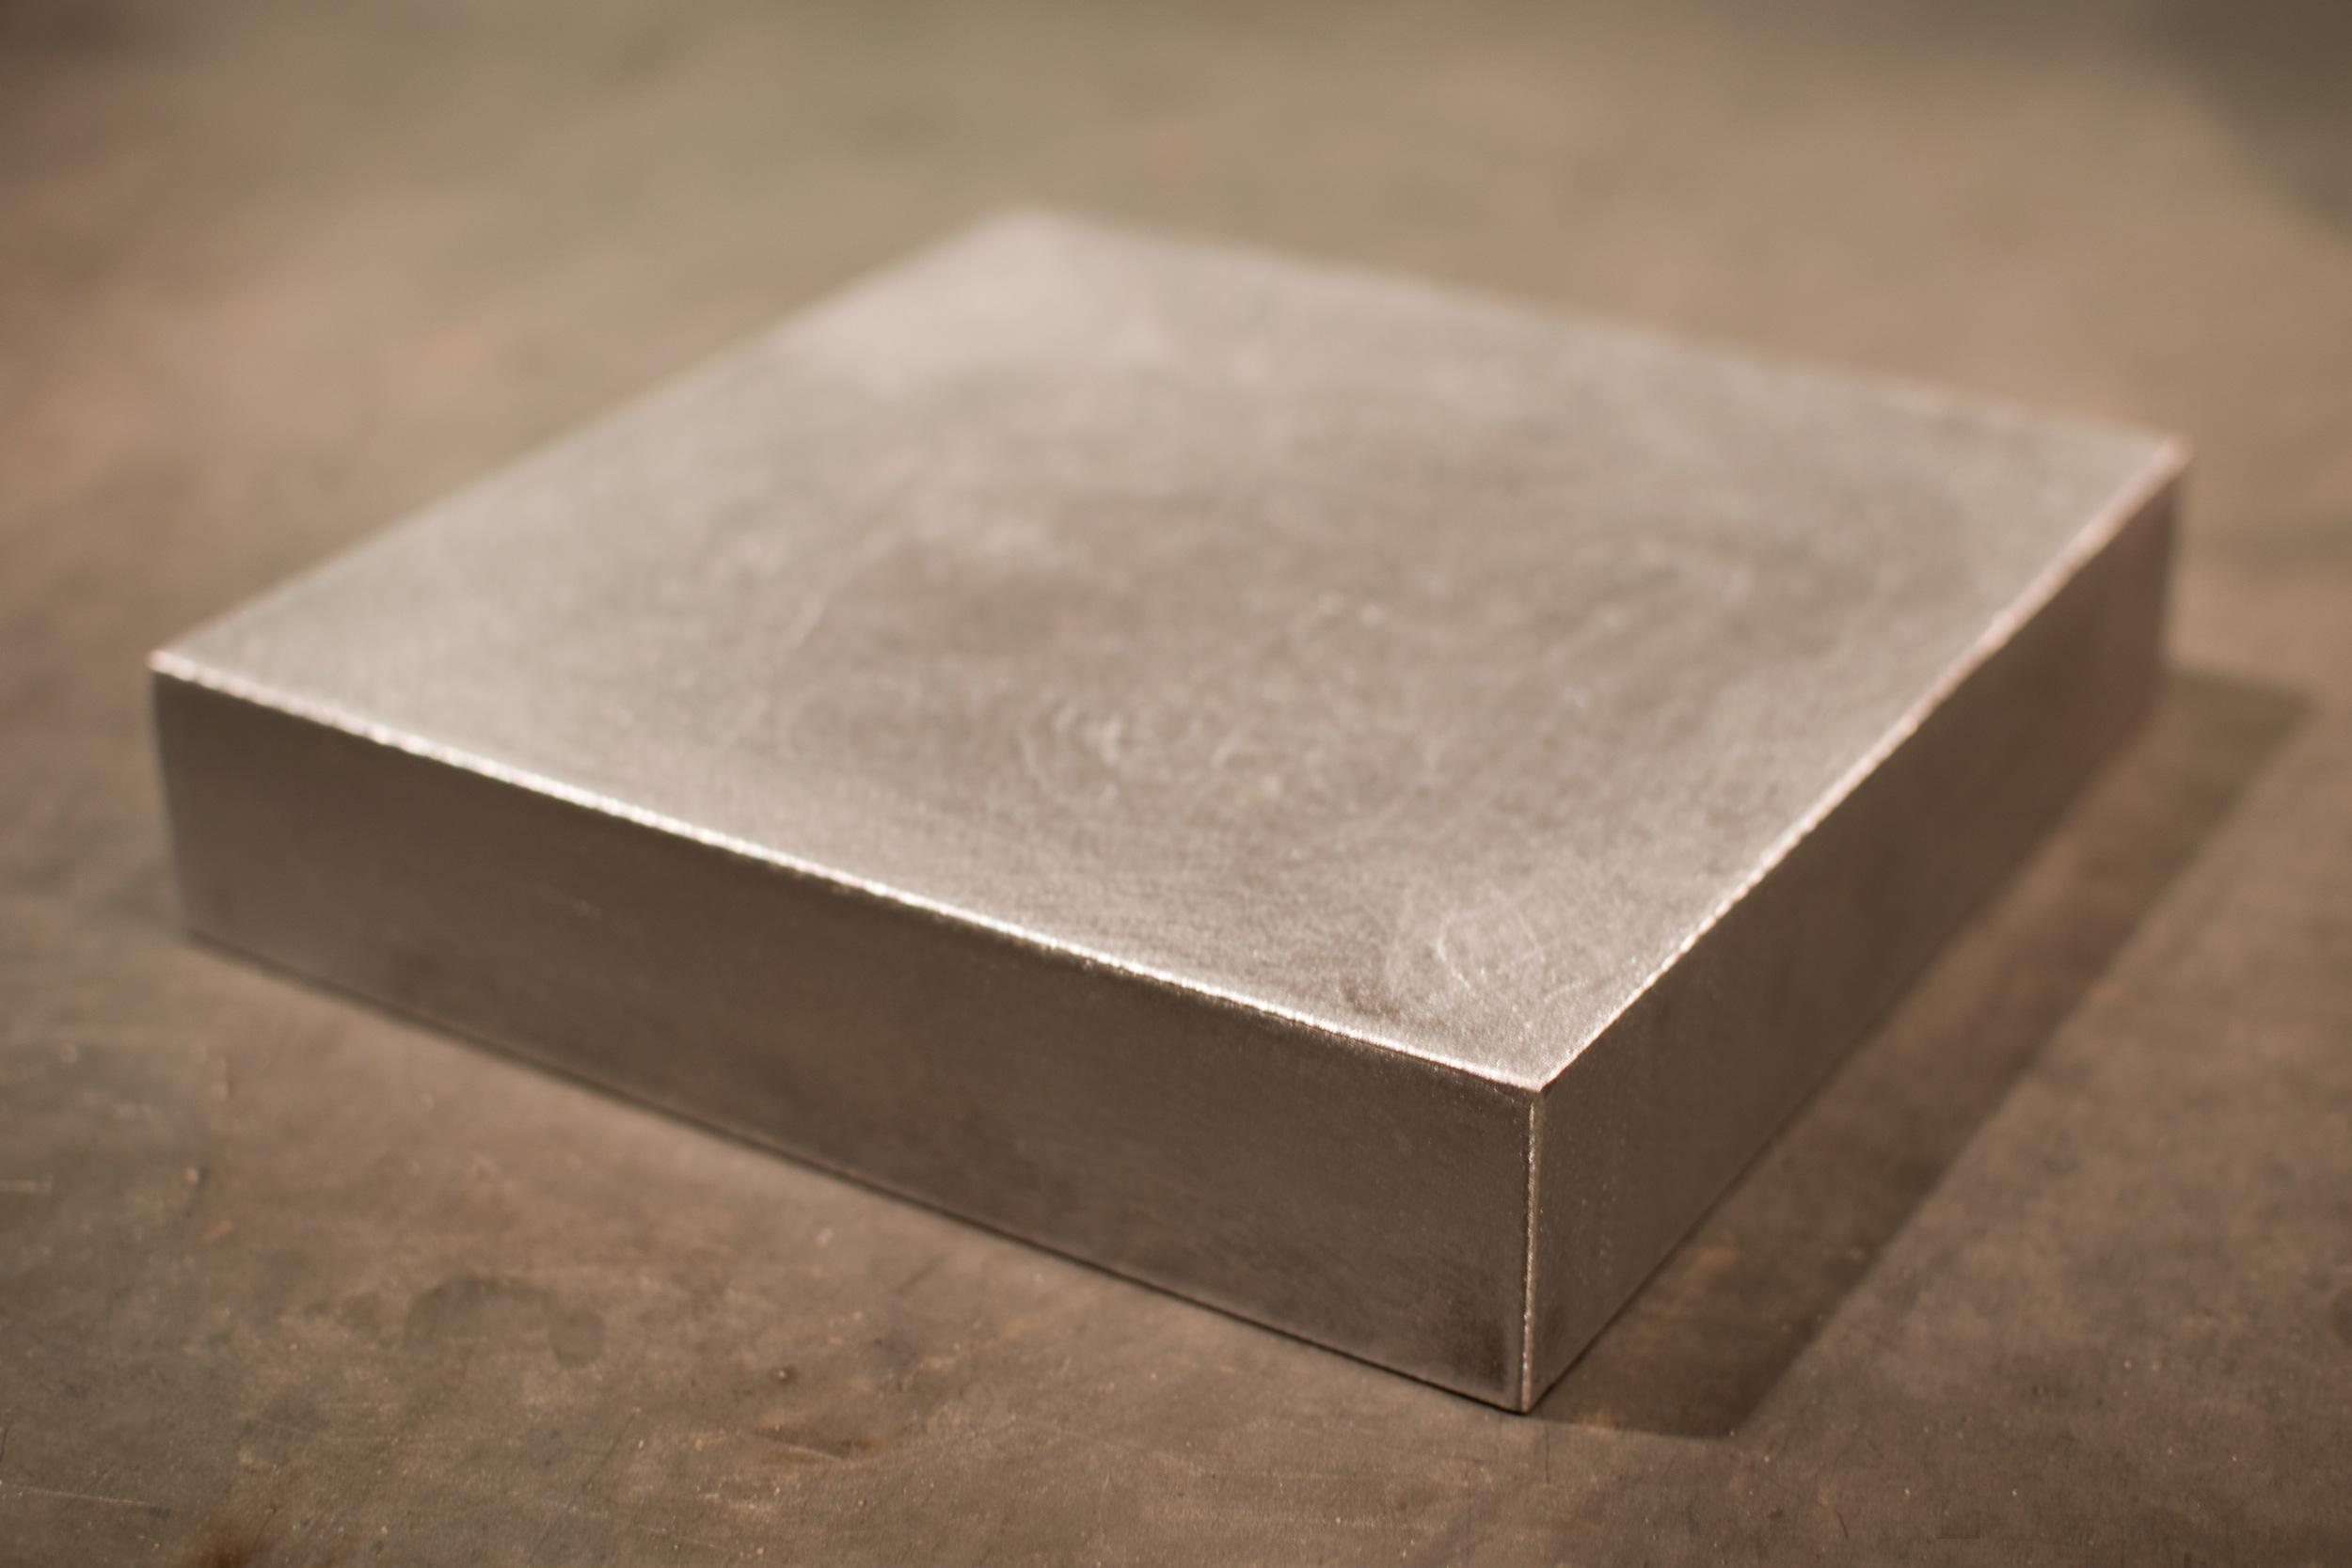 welded-ground-steel-base.jpg